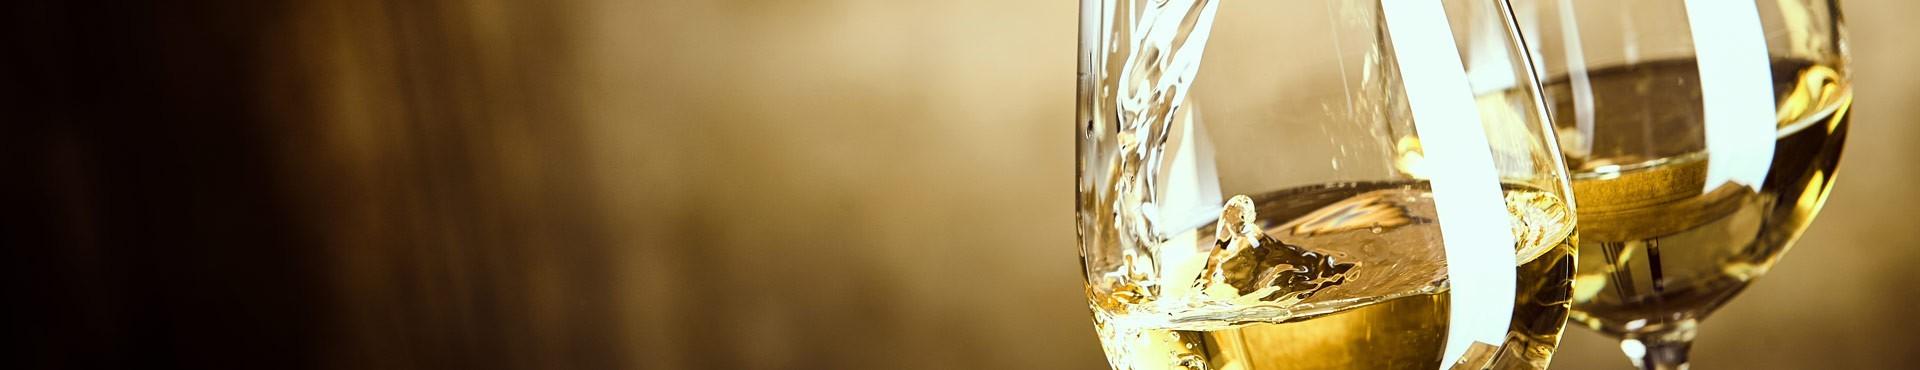 Nos vins blancs - OnWine